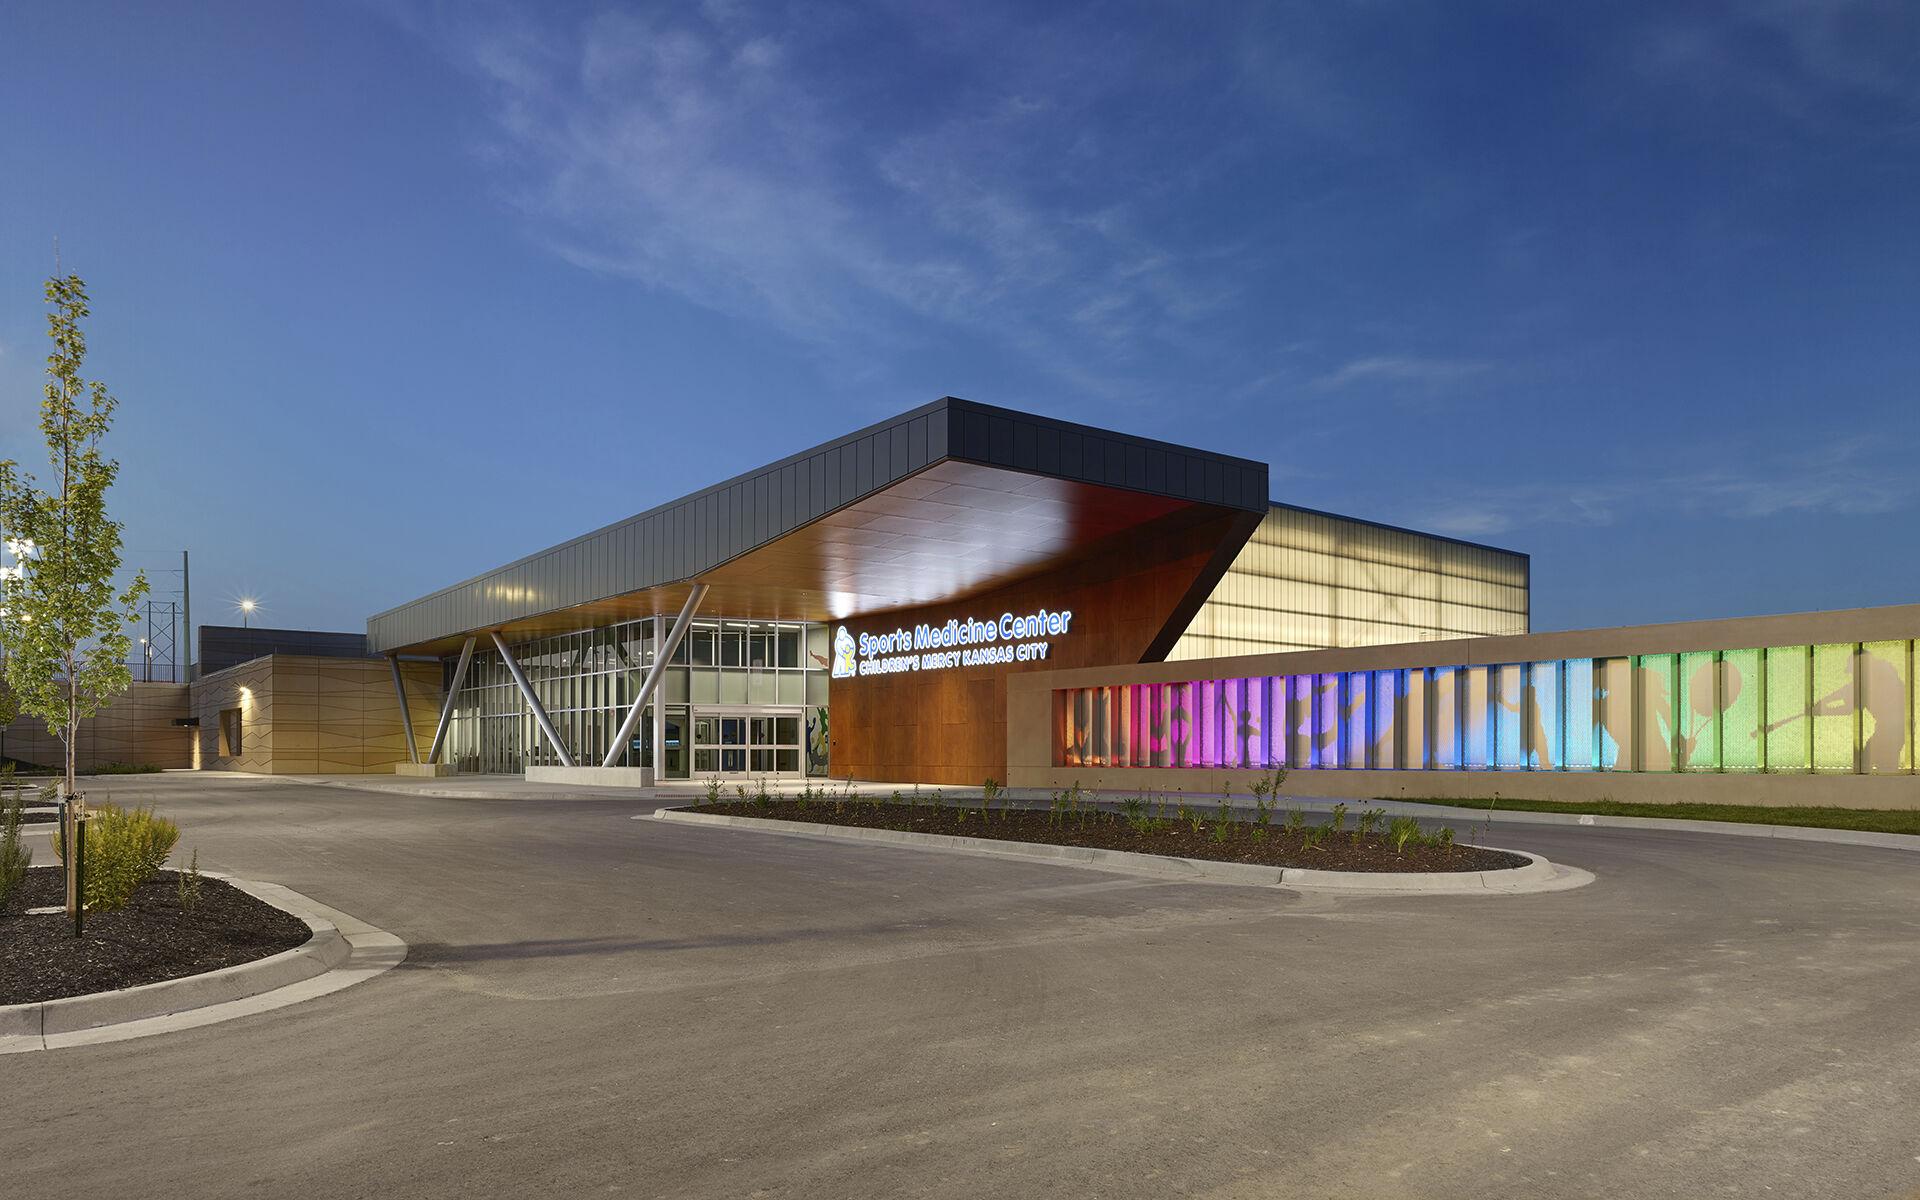 Pinnacle National Development Center - Sporting KC & US Soccer